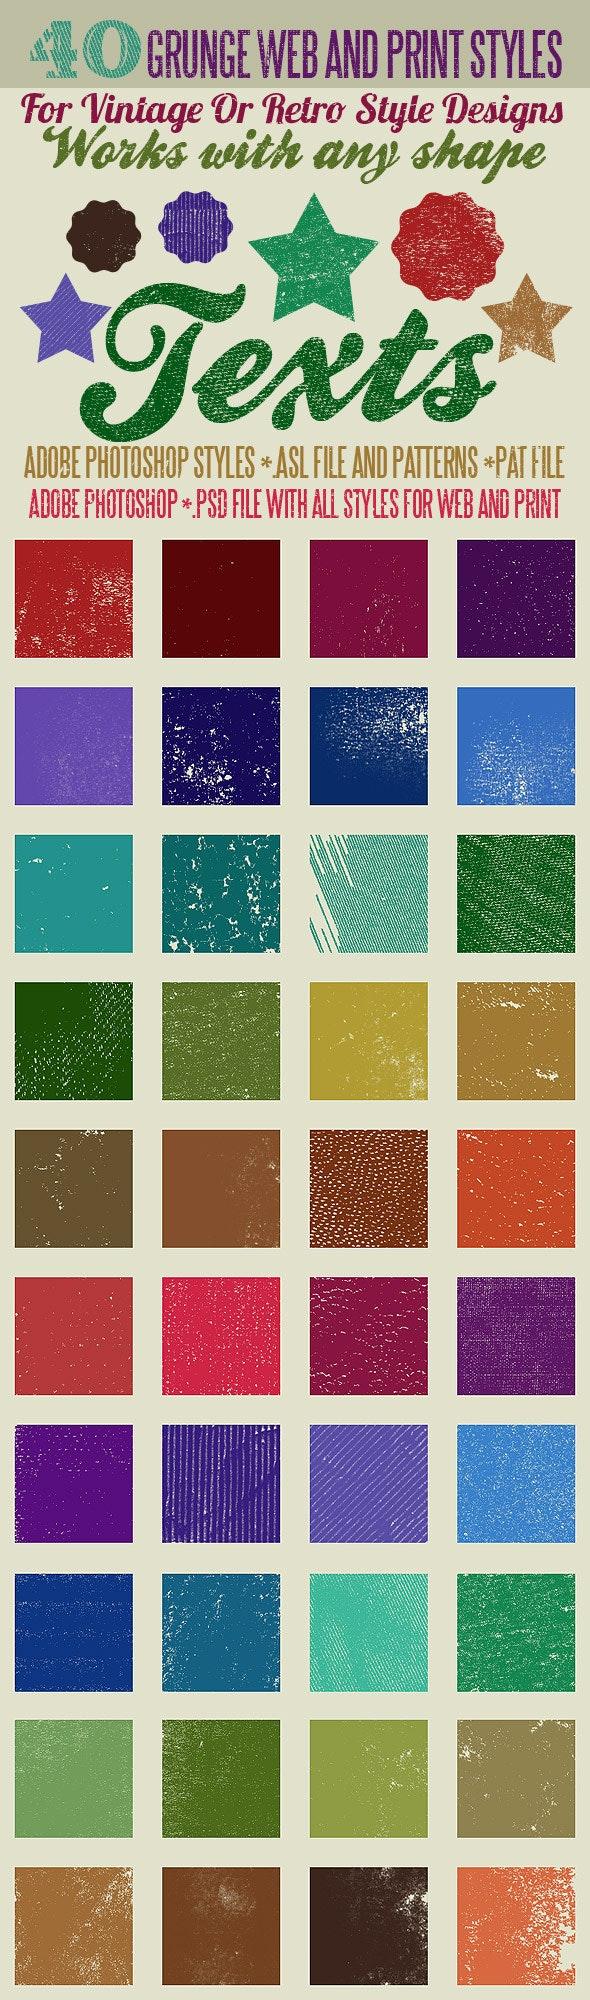 40 Grunge Photoshop Styles And Patterns - Styles Photoshop